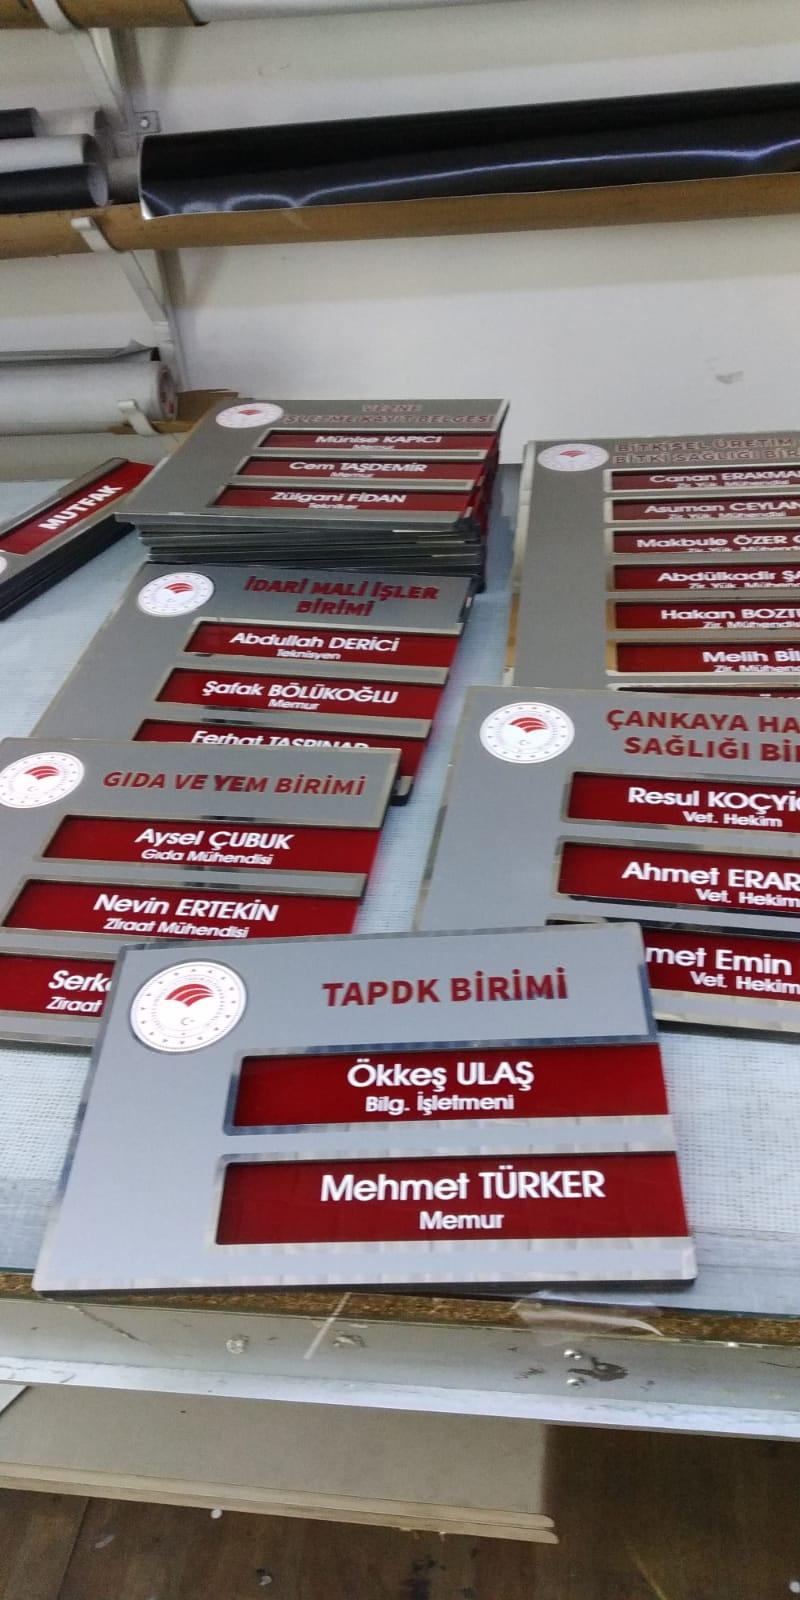 Ankara Tabela, Tabela Ankara, İstanbul Tabela, Tabela İstanbul, Ankara Tabela Firmaları, Ankara Tabela Reklam, Ankara Yönlendirme, Tabela, Ankara Araç Giydirme, Ankara Araç Kaplama, Anka (31)